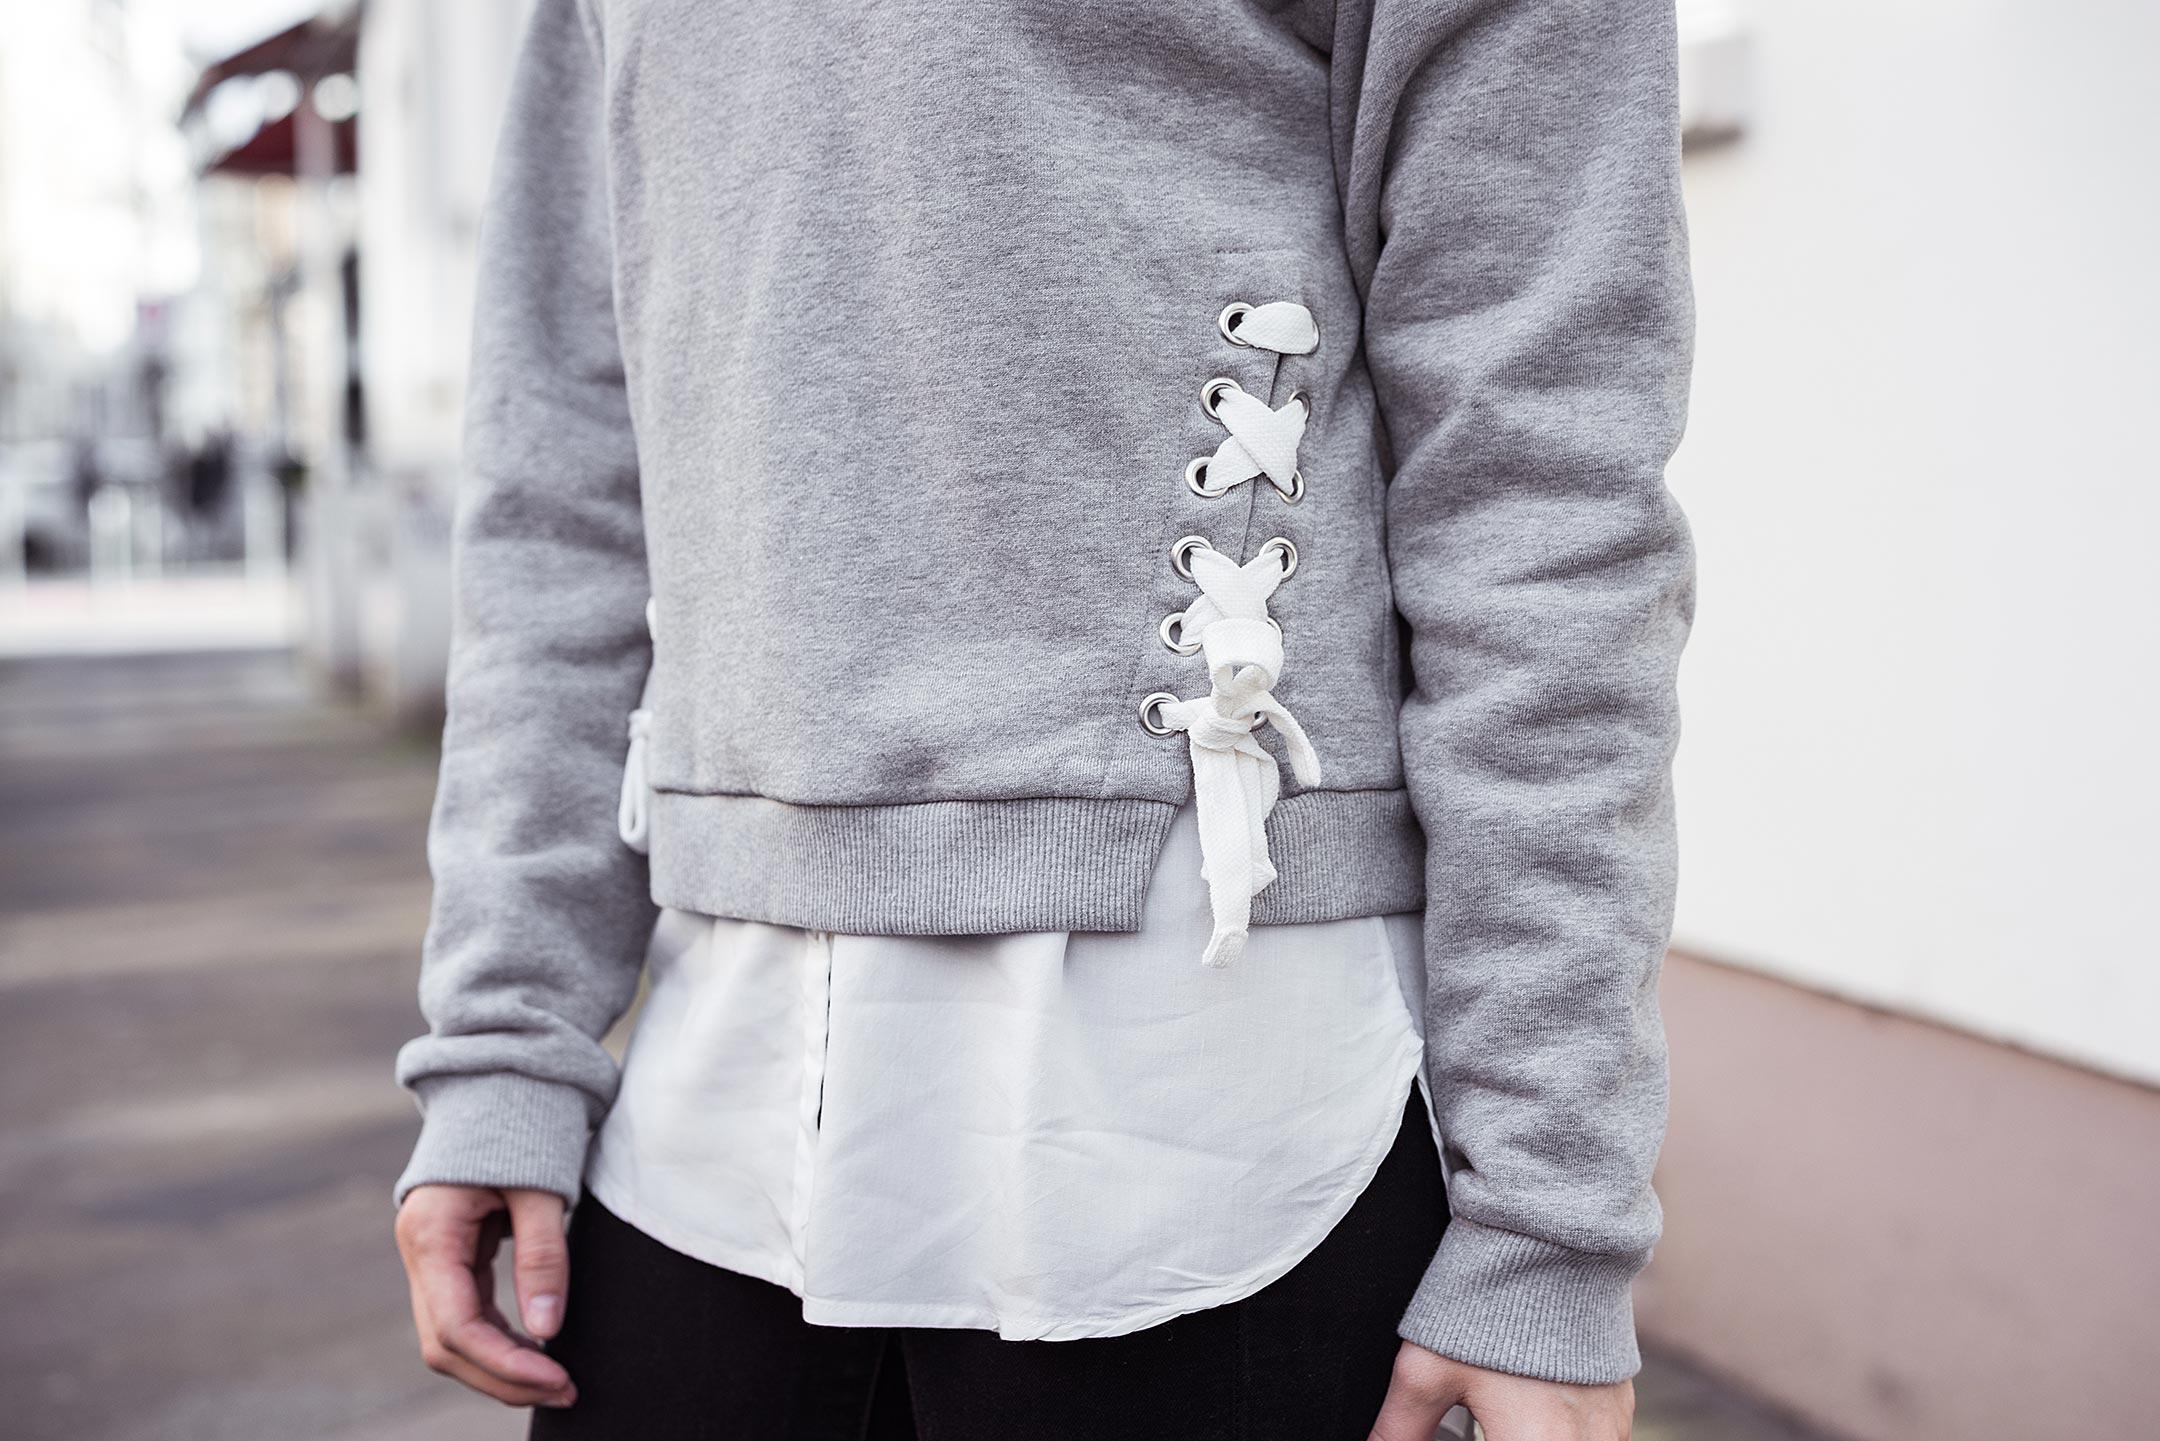 Sweatshirt Pullover Schnürung grau Outfit Sunnyinga Fashionblog